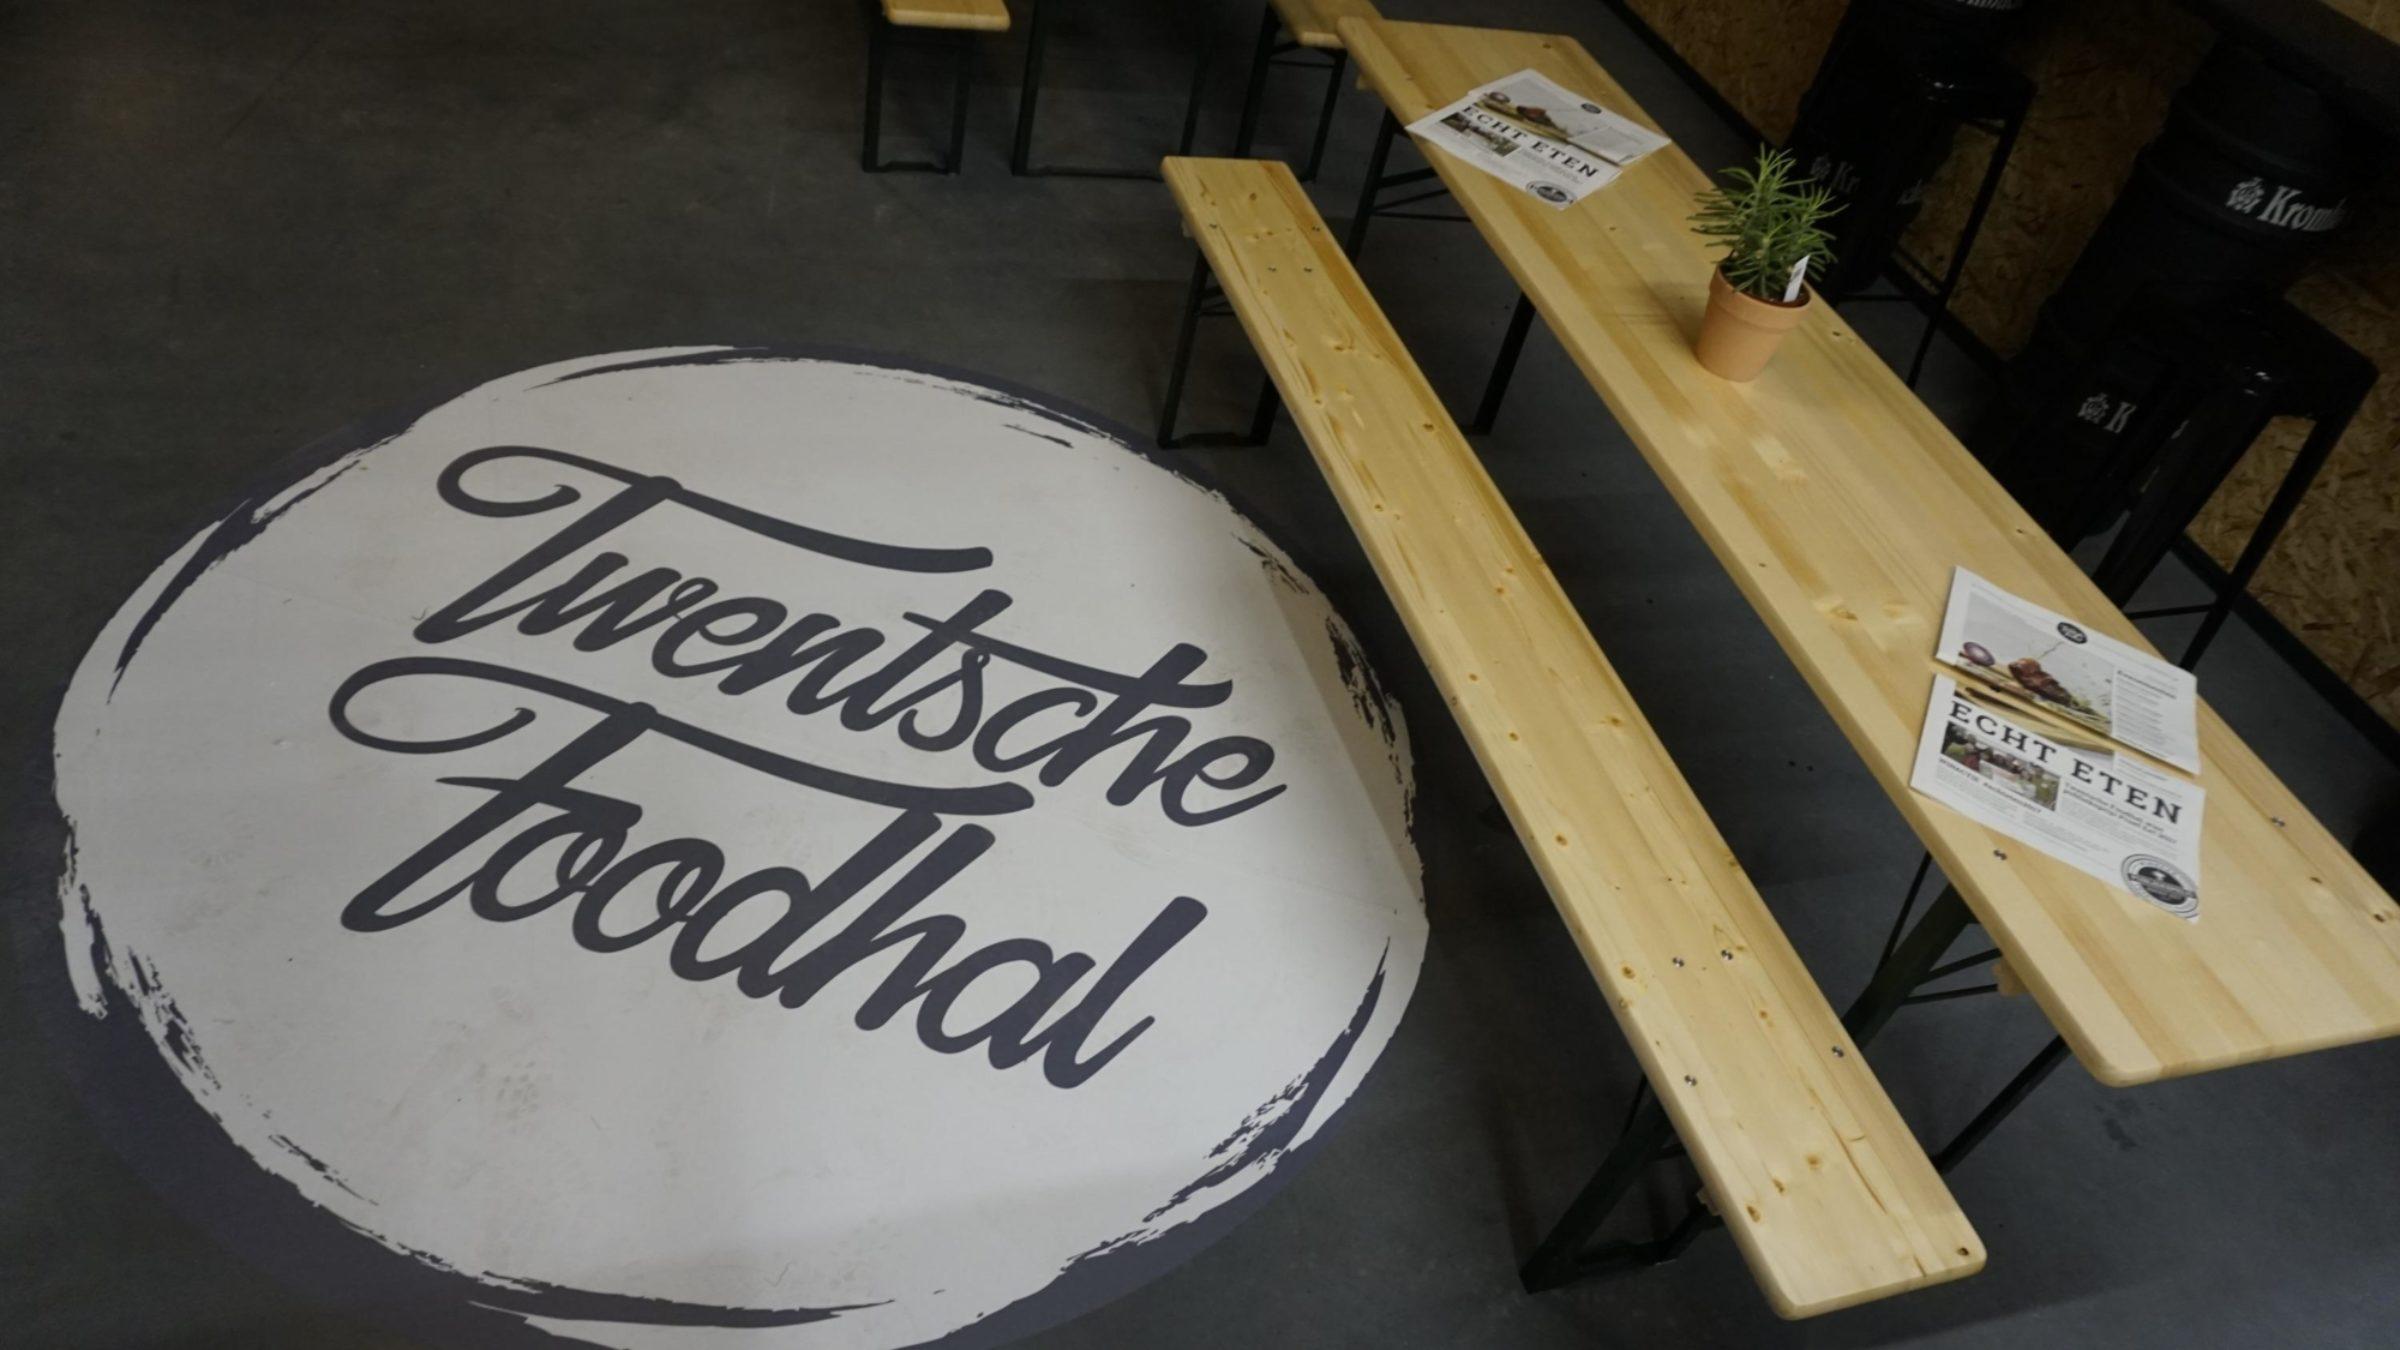 Twentsche Foodhal12017